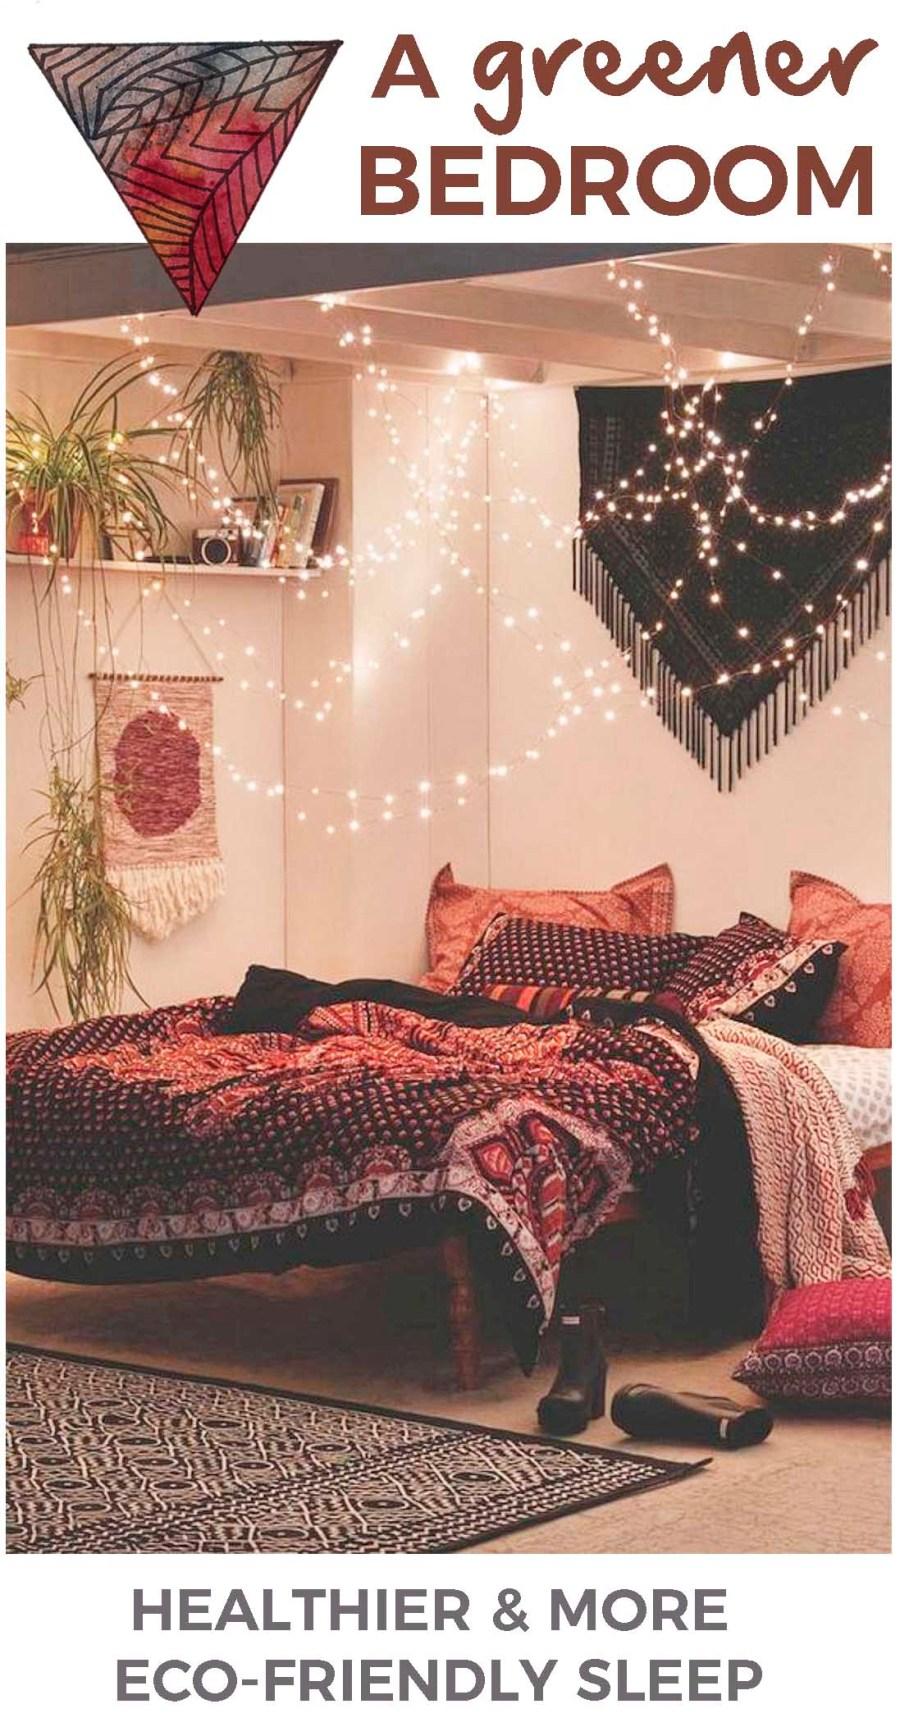 A Greener Bedroom - make your sleep healthier & more eco-friendly - theweekendguide.com